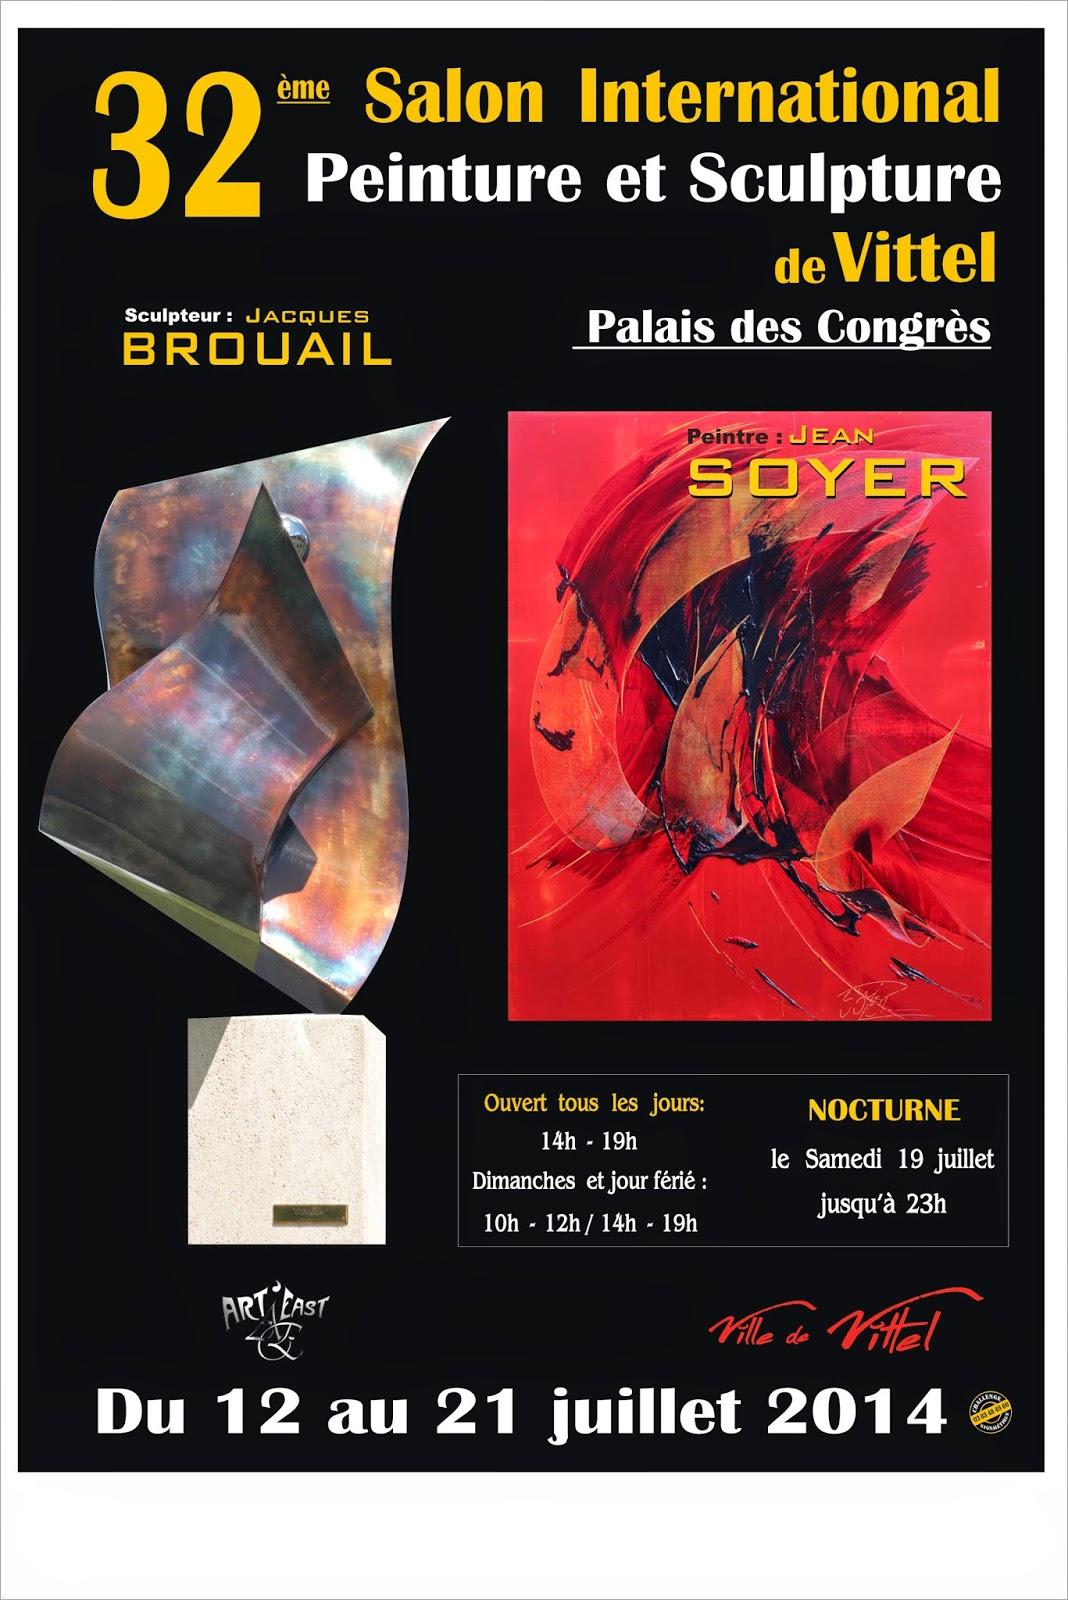 http://digiflyer.lorraineaucoeur.com/digi-flyer/0008652314c4fa639b733